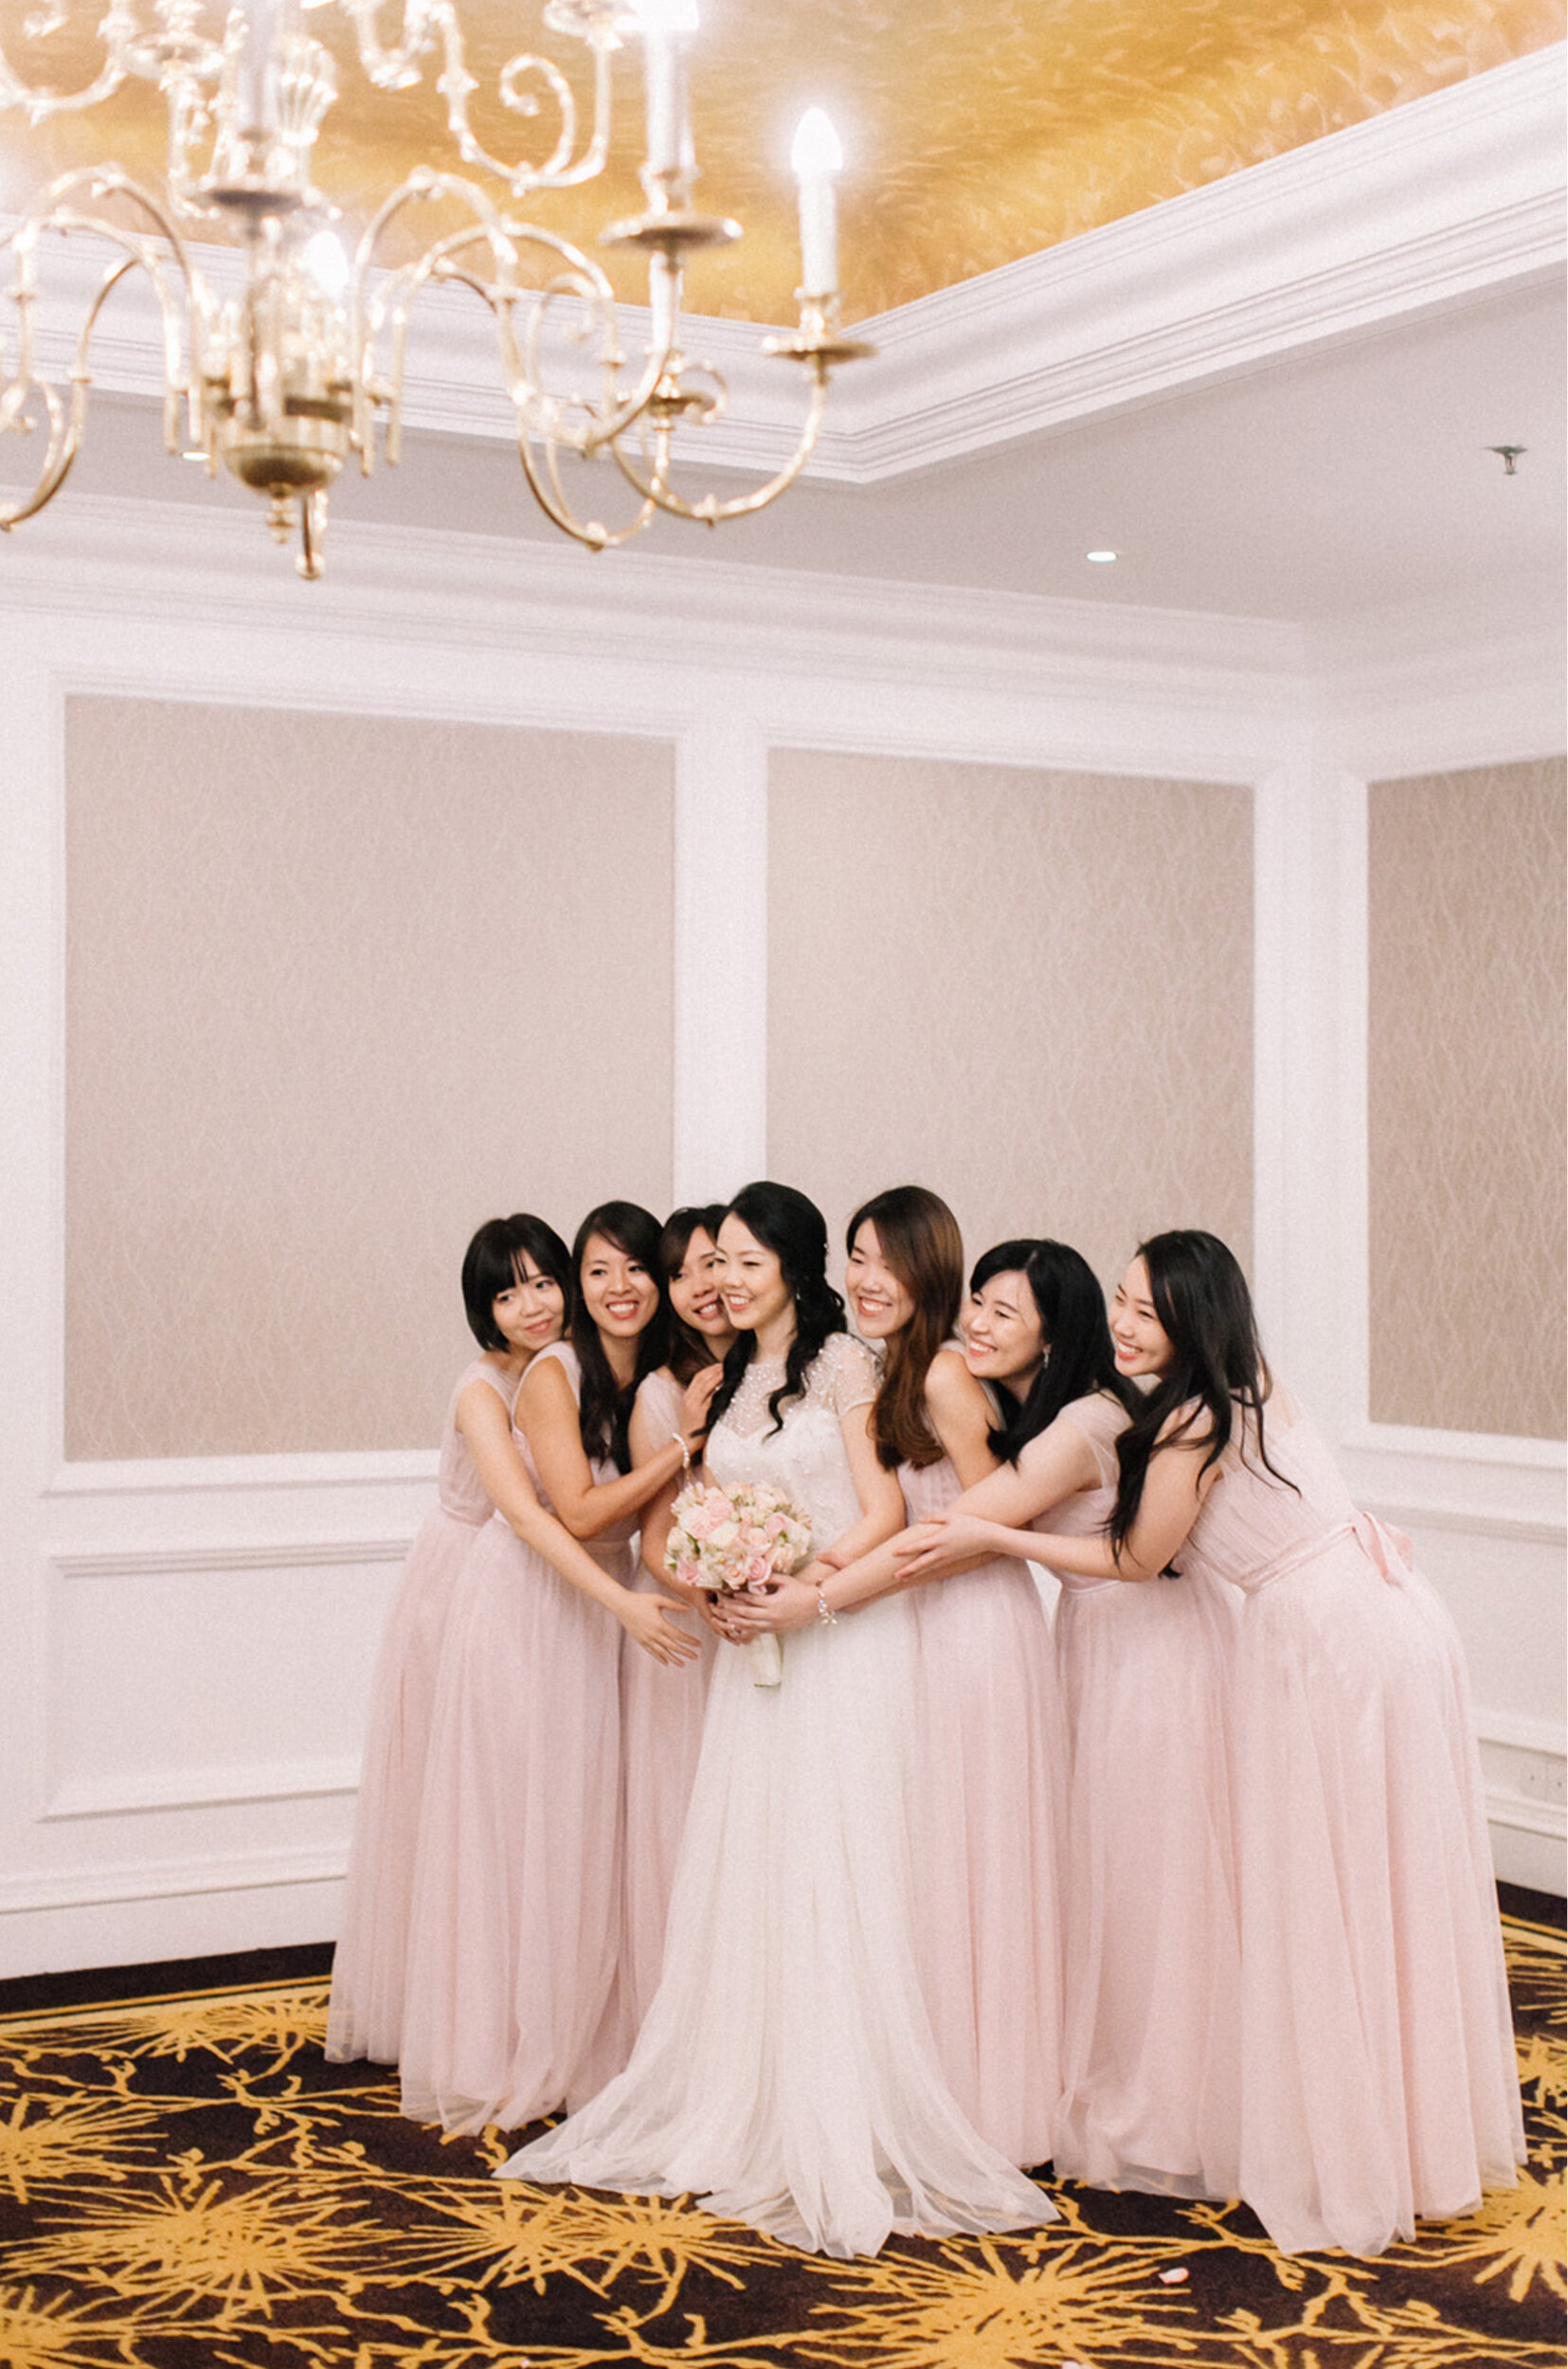 MASYVNN & YEE TENG - ROM Ceremony at The Ritz Carlton Kuala Lumpur